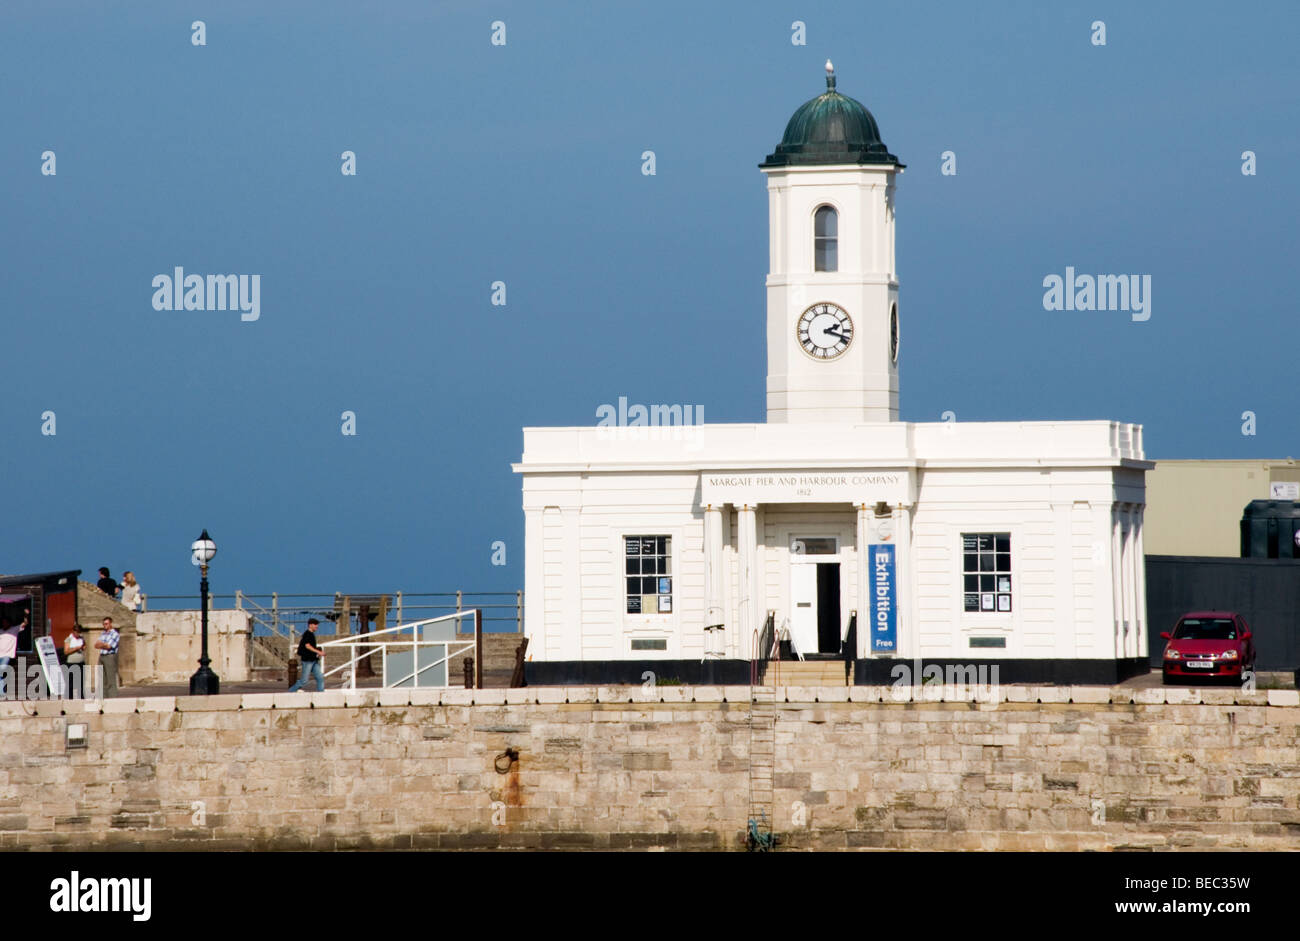 Droit House on Margate jetty, Margate, Kent, England - Stock Image